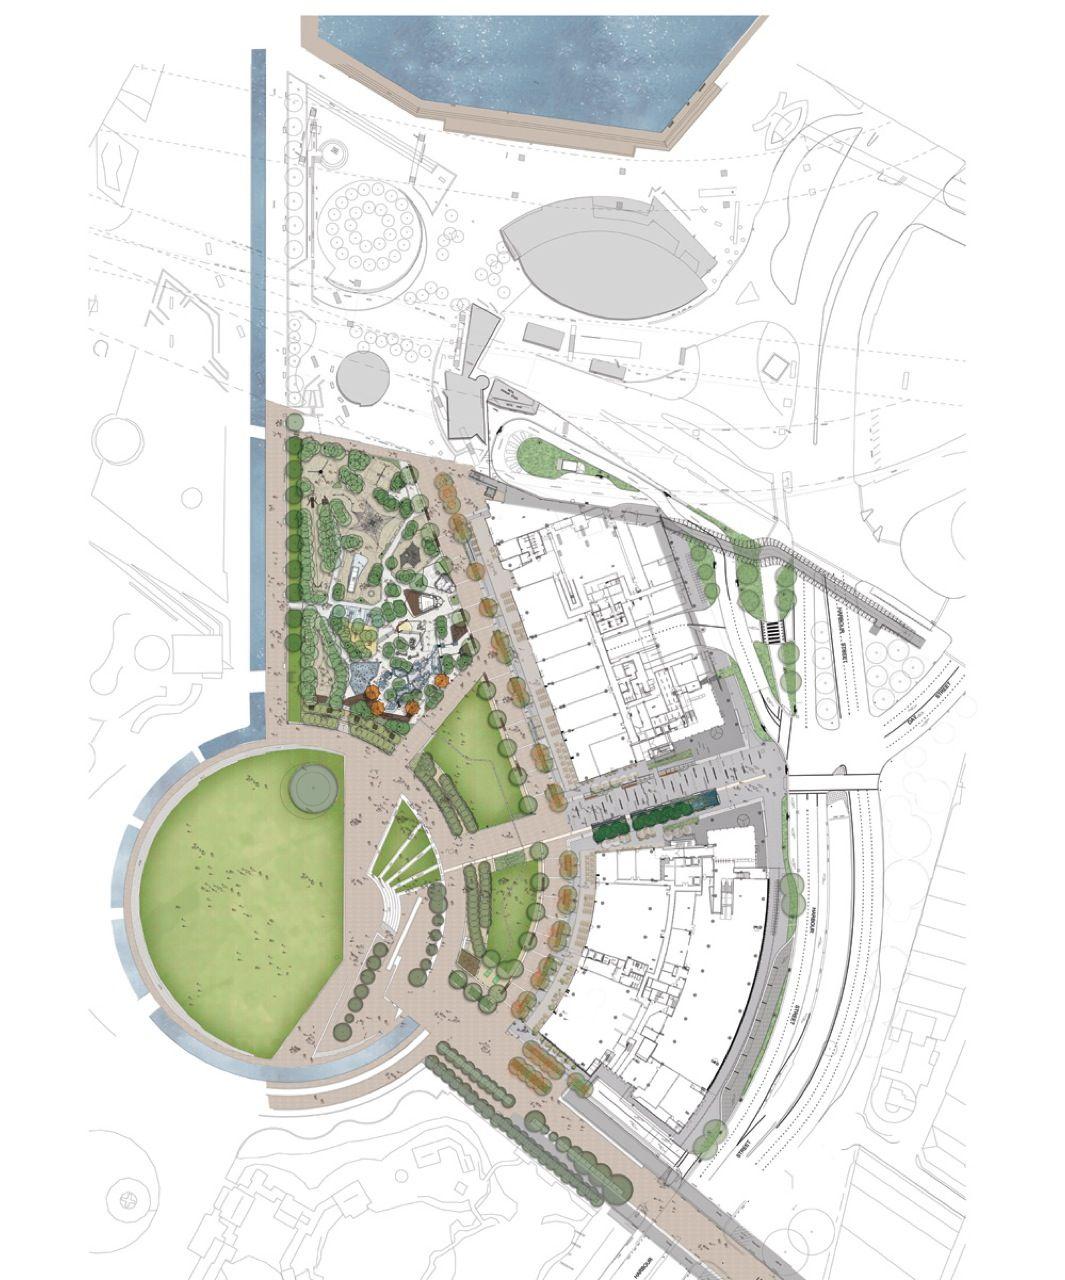 1319146331 landscape master plan active 1065 for Site plan with landscape